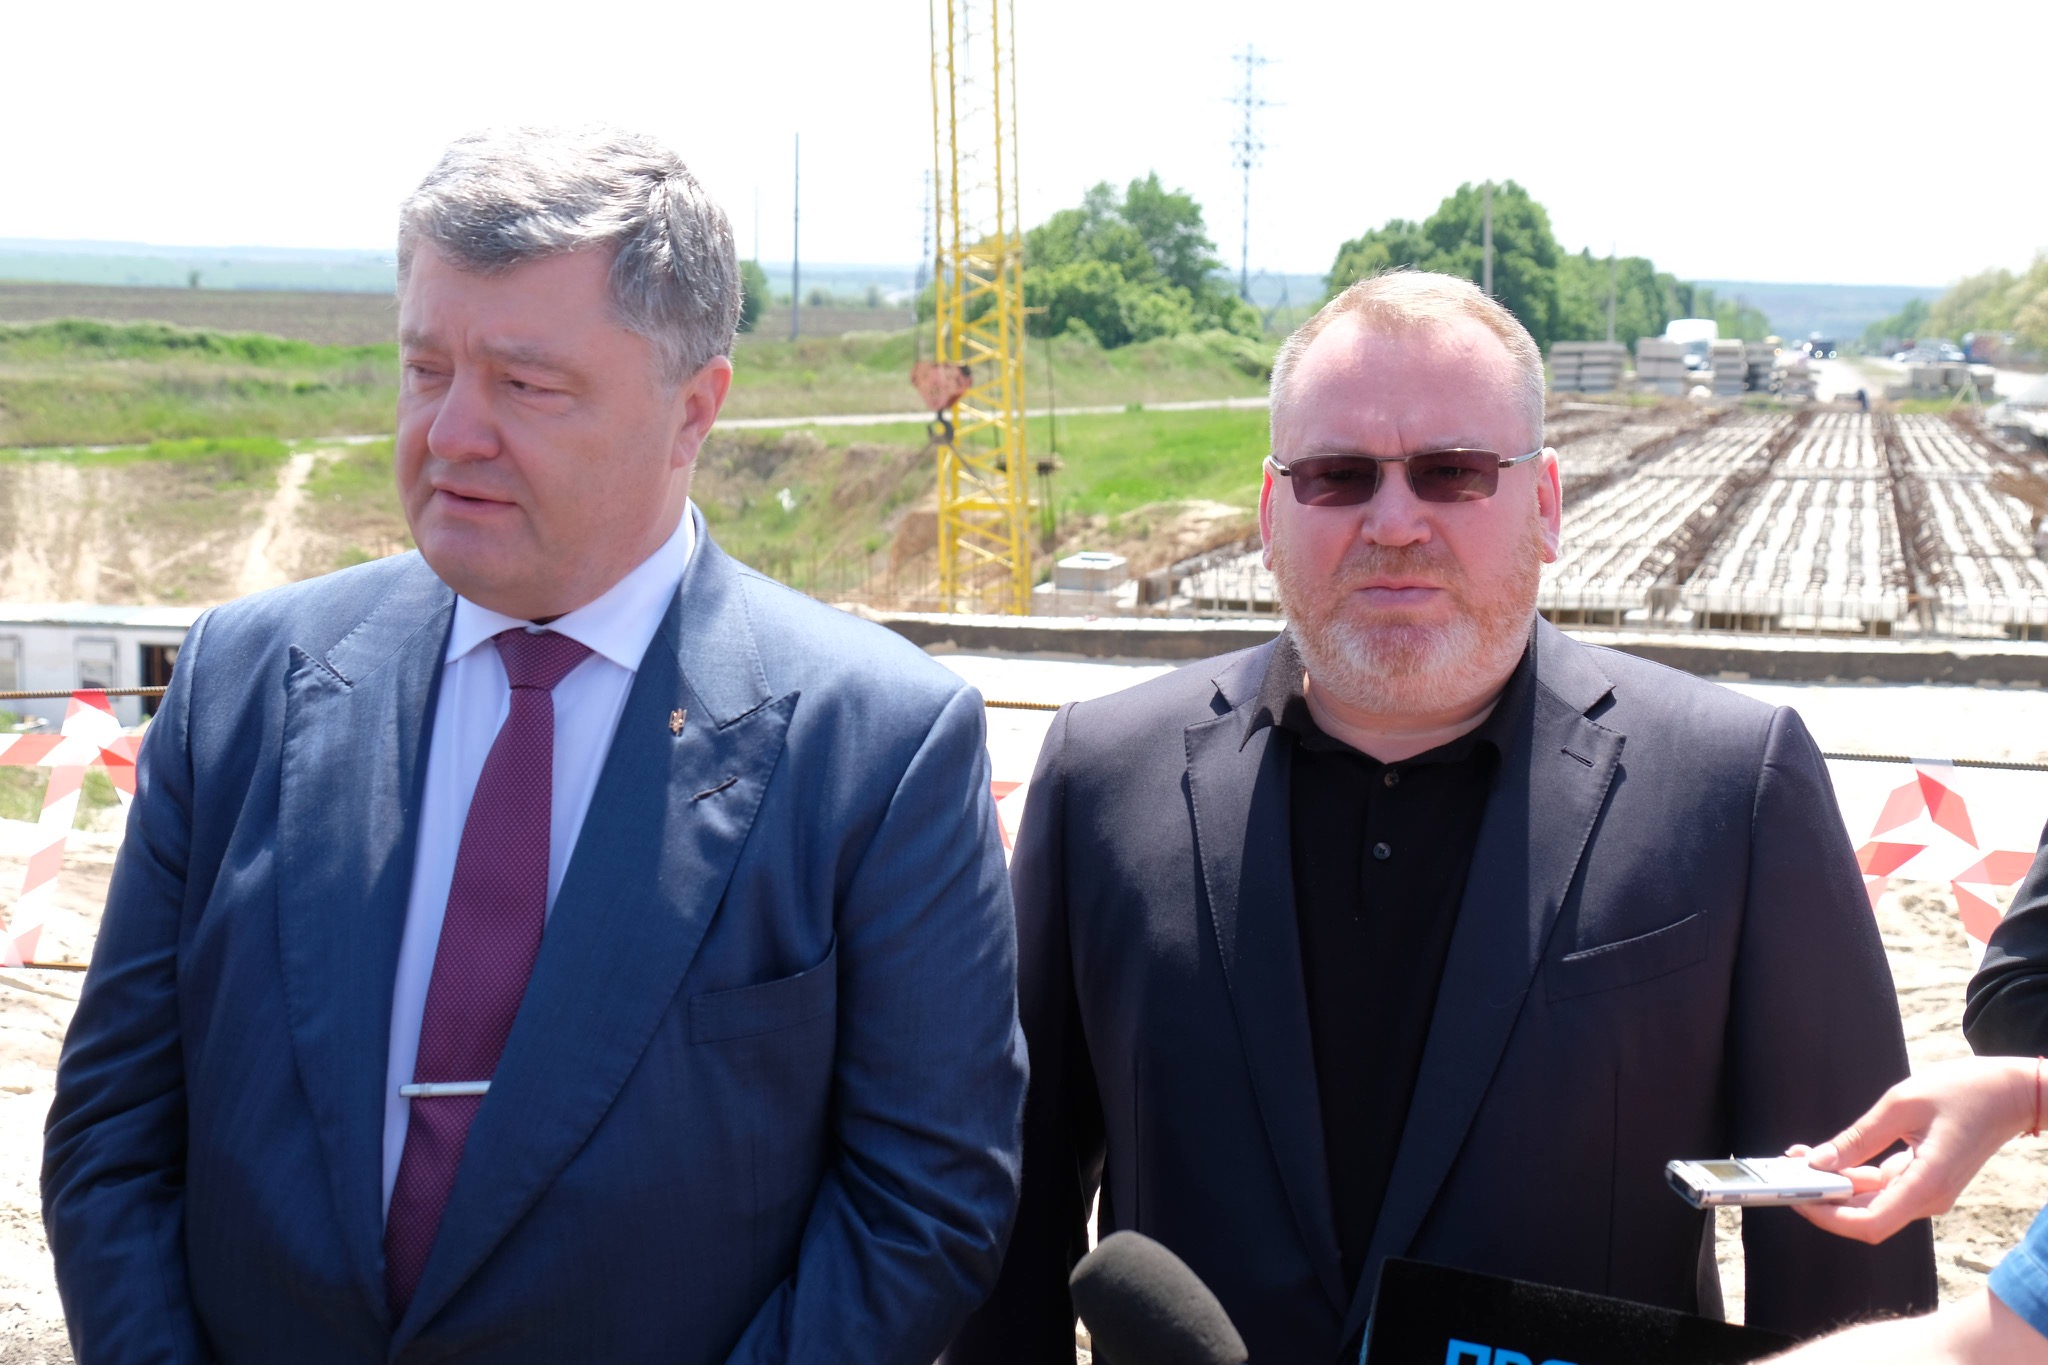 Петр Порошенко и Валентин Резниченко